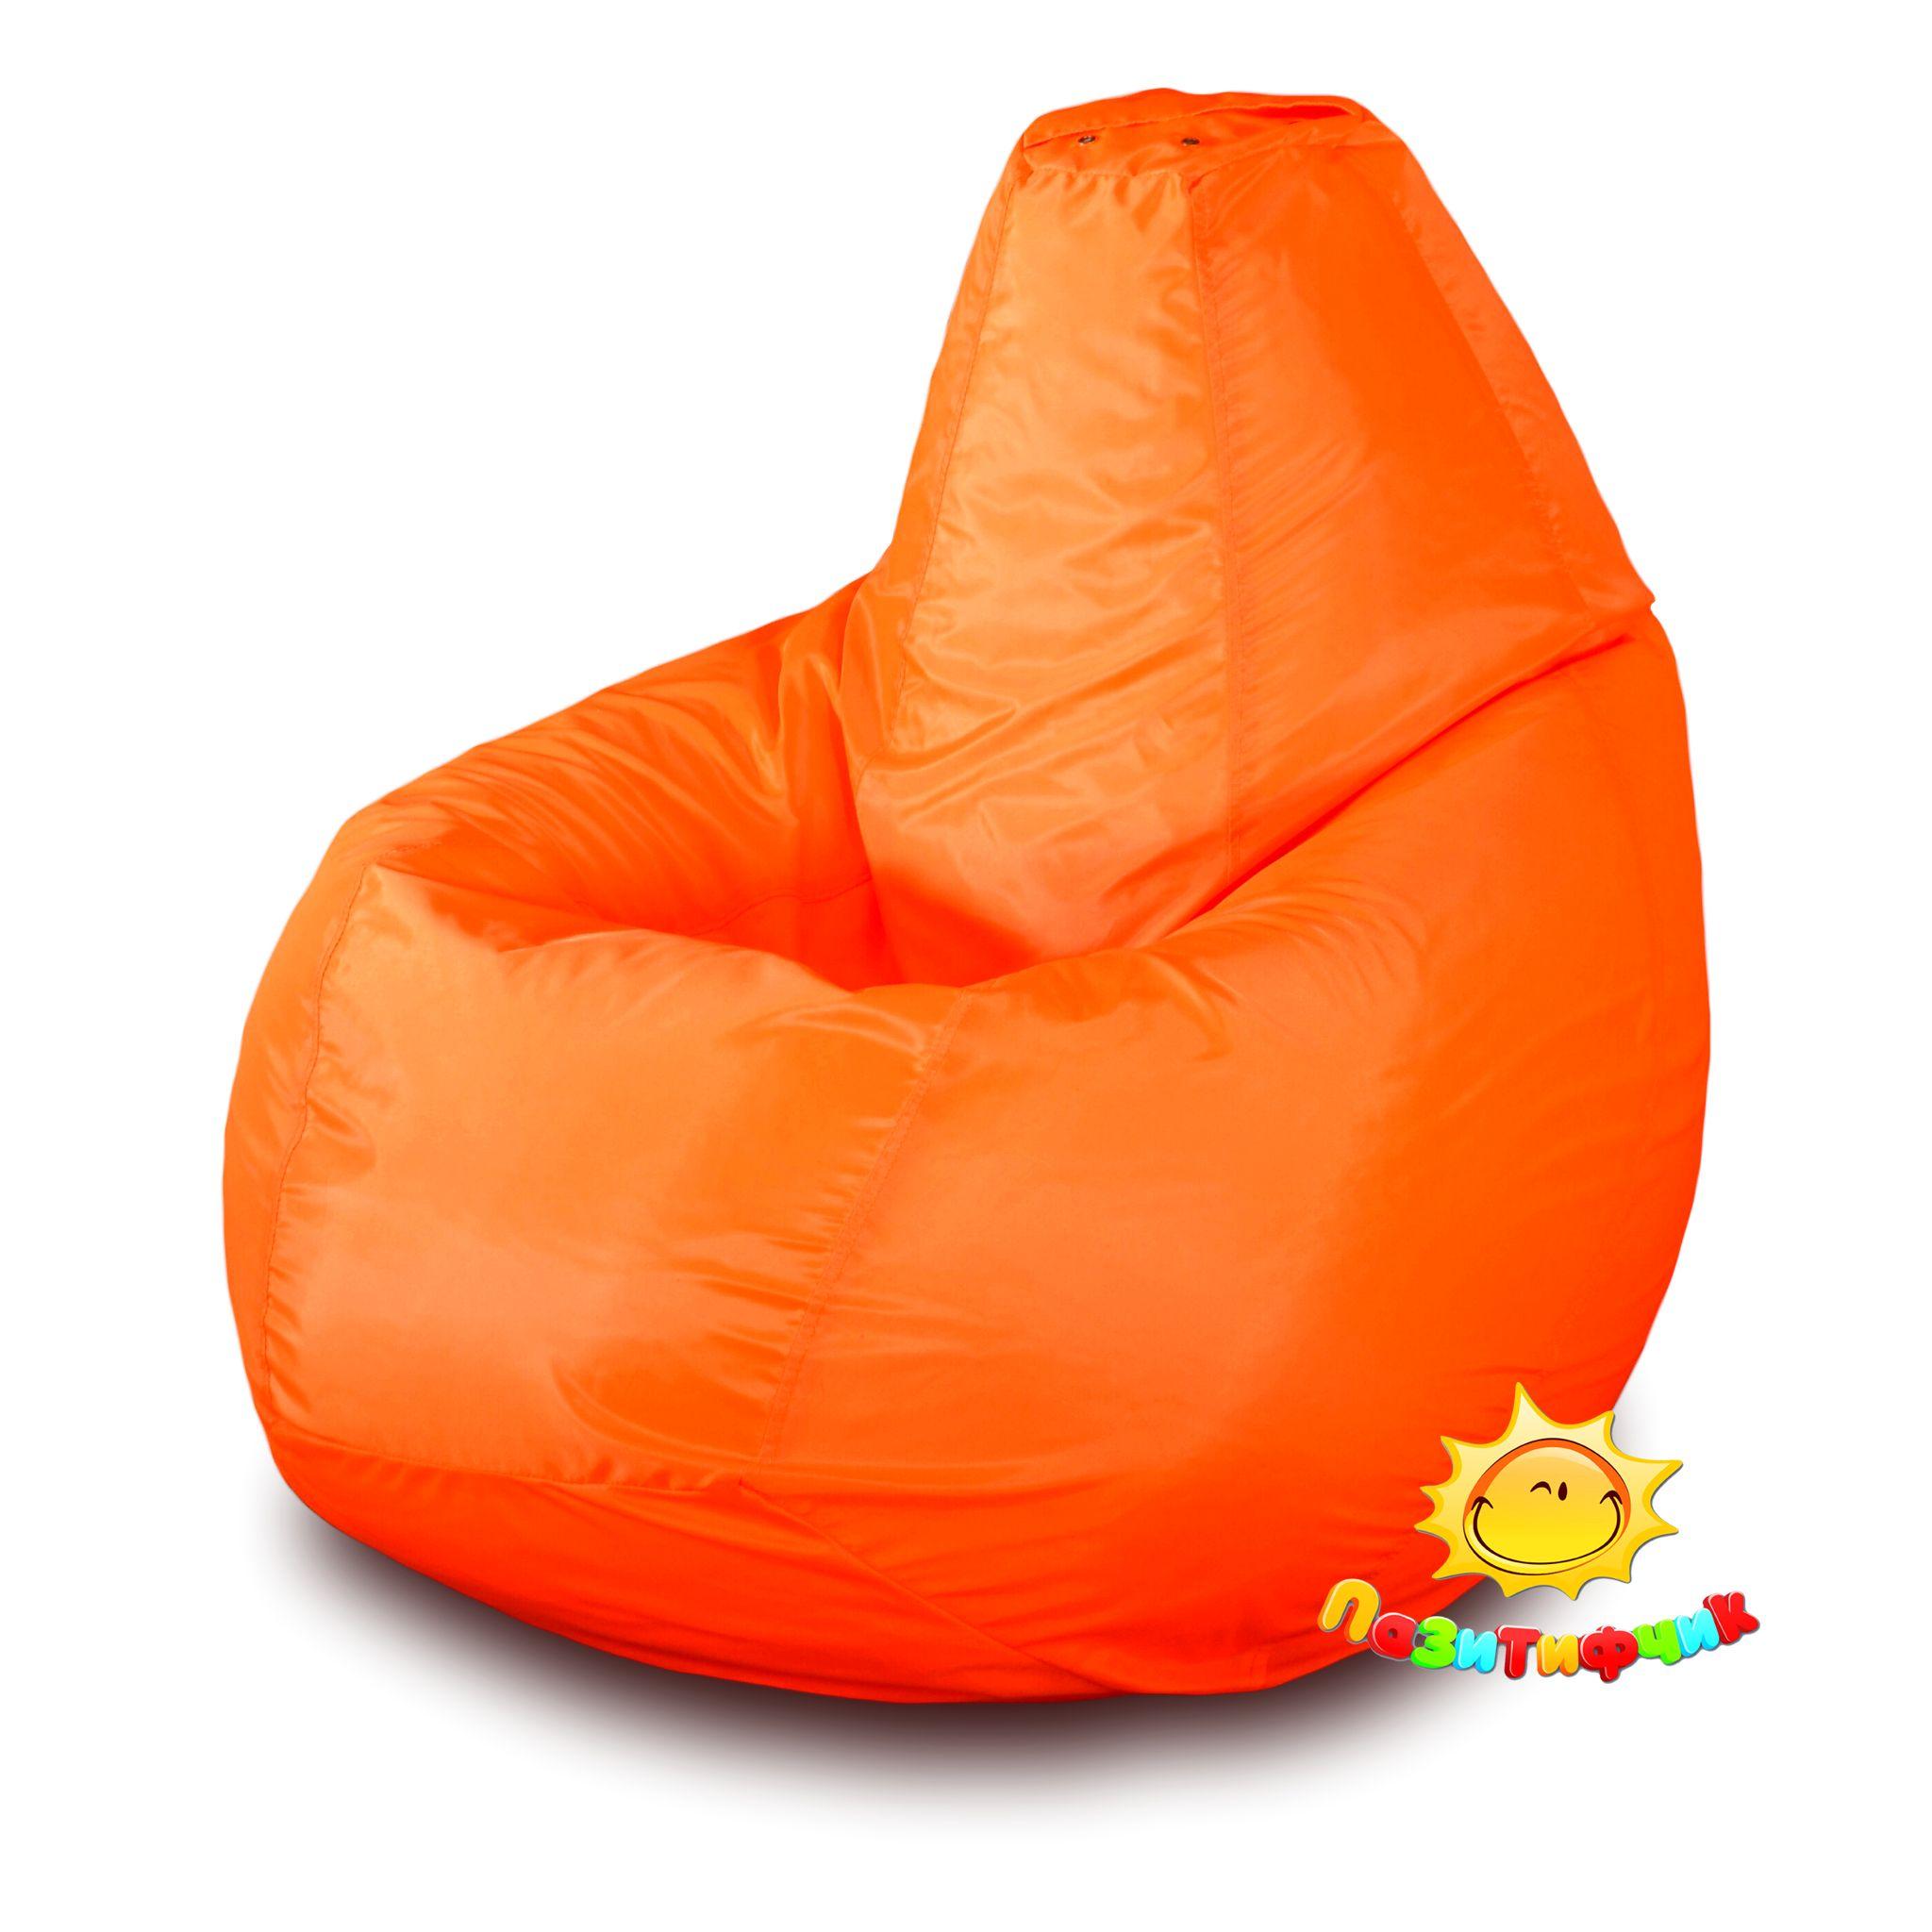 Кресло-мешок Pazitif Груша Пазитифчик Оксфорд, размер XXXL, оксфорд, оранжевый